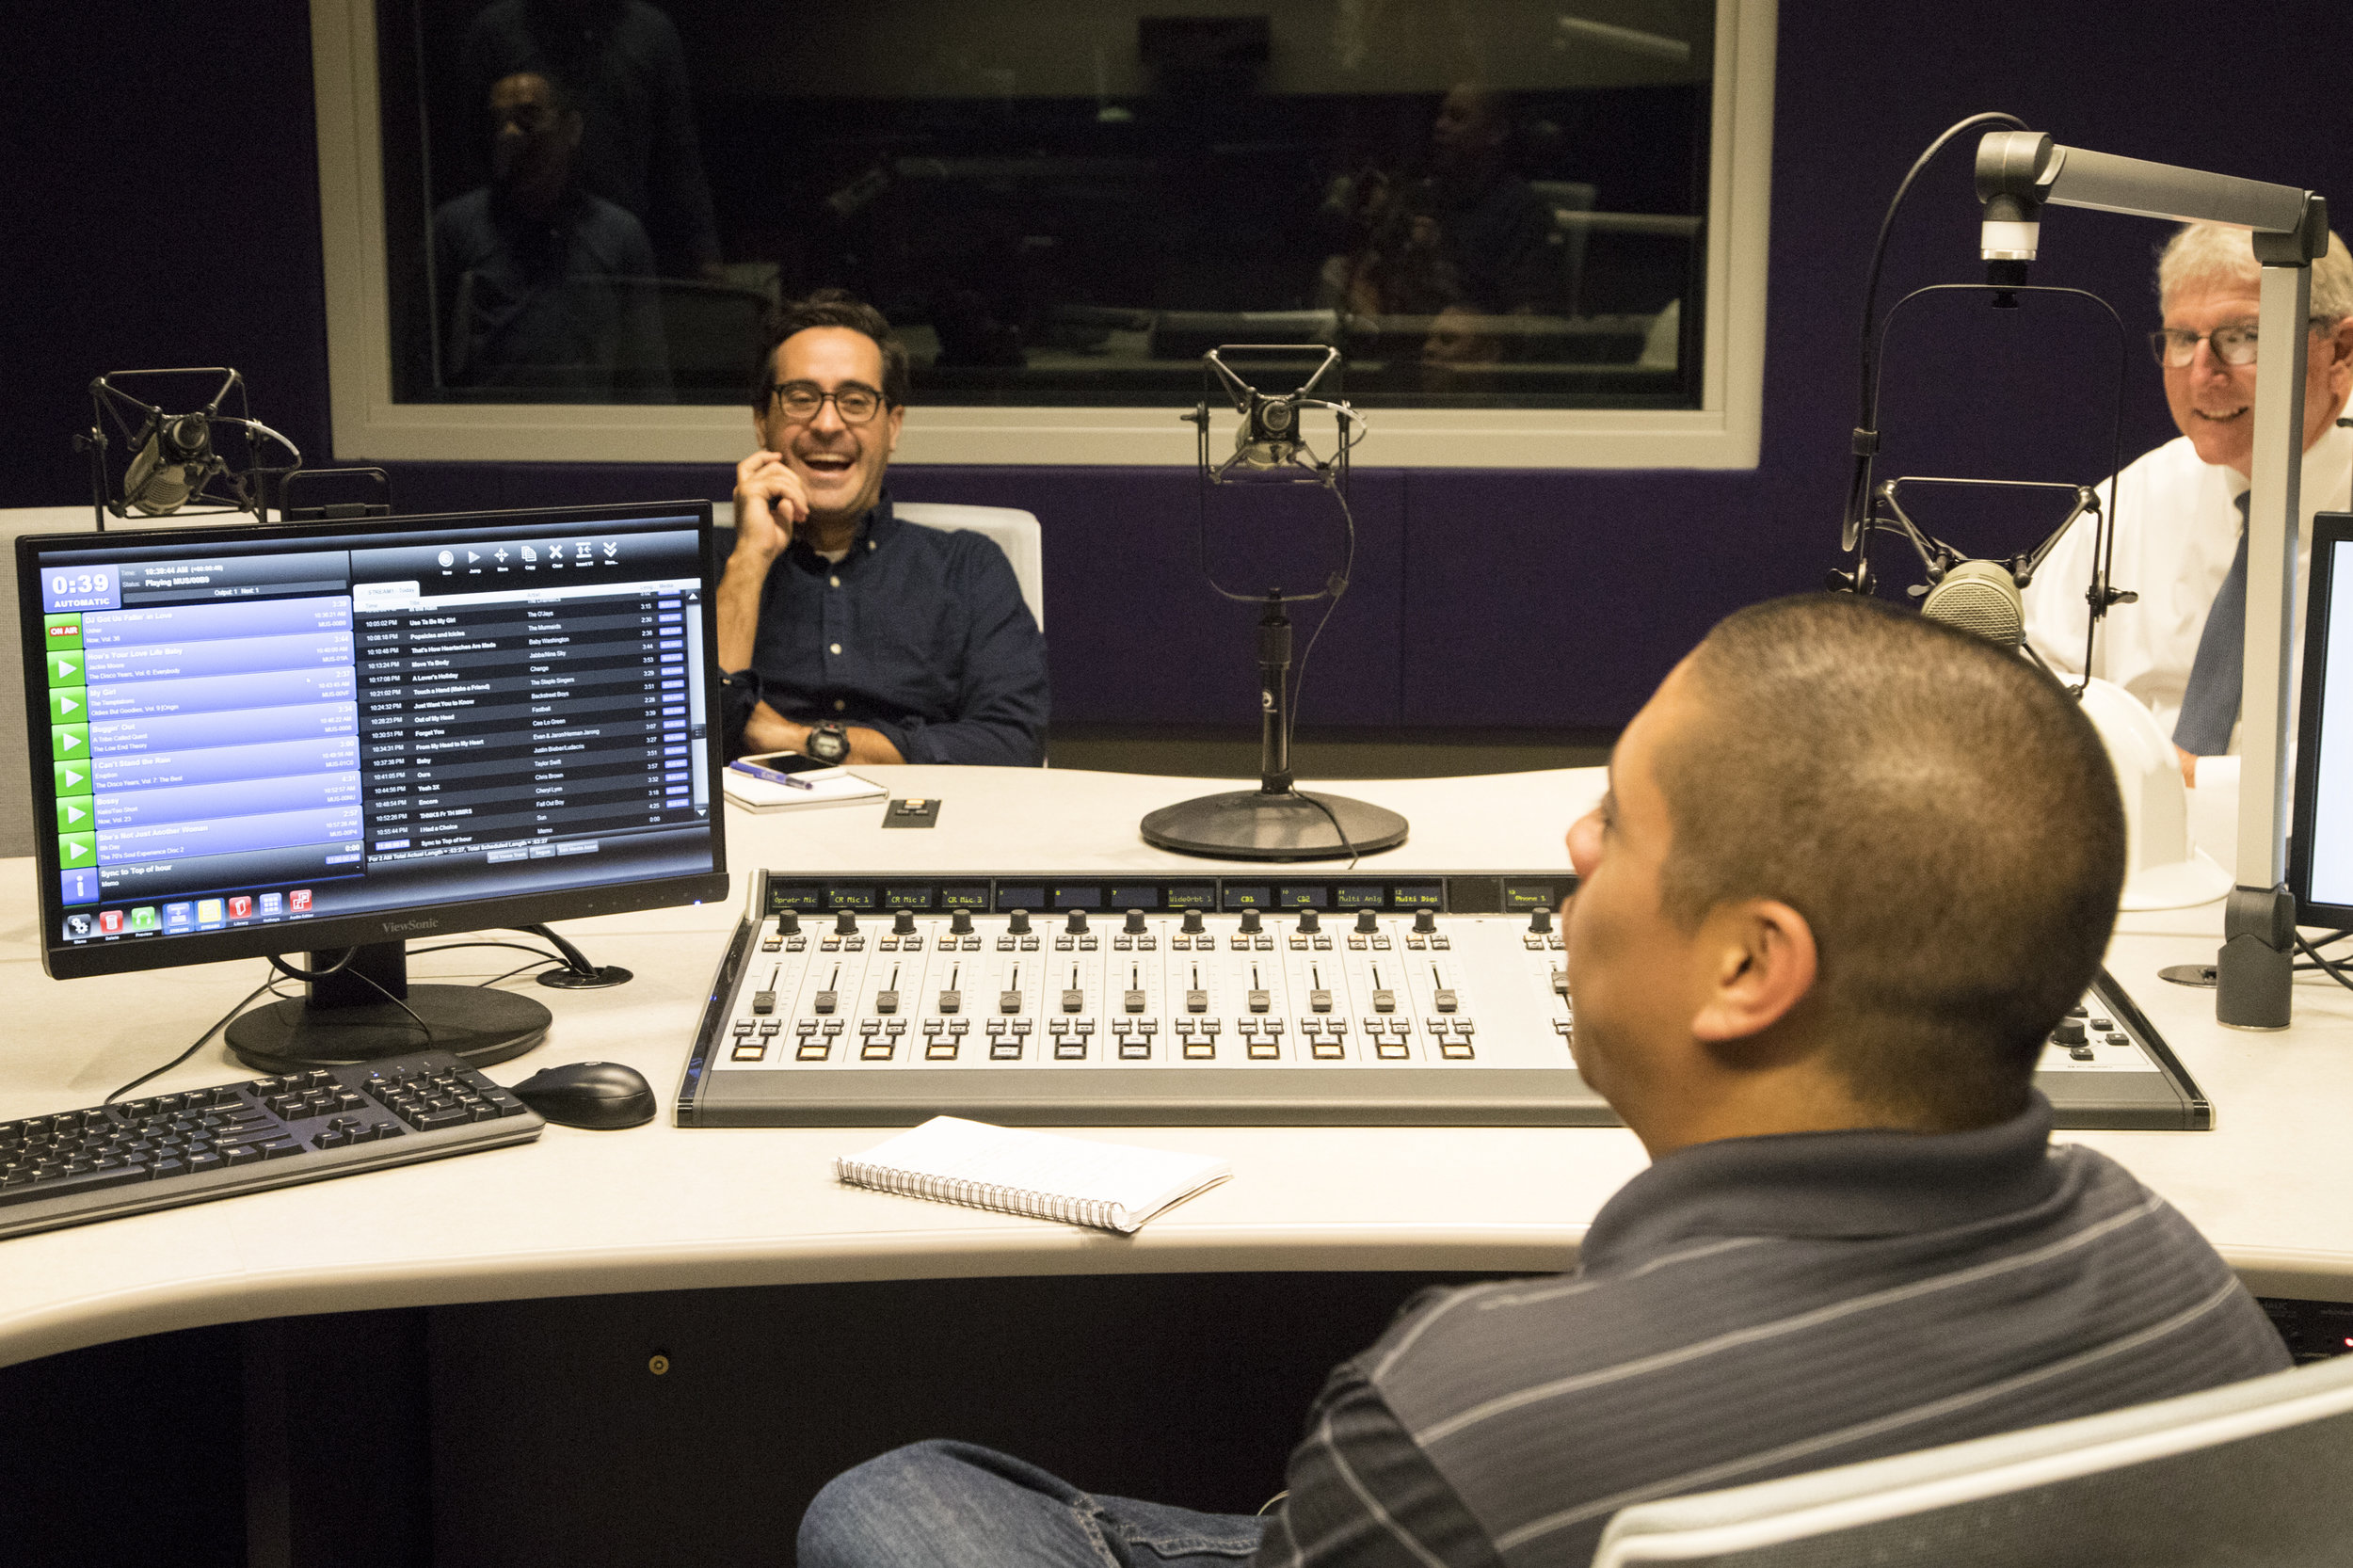 On September 14, 2017 Ben Howell (left), Robert Tabarango, and Greg Brown discuss the new radio studio in the Center for Media and Design campus in Santa Monica, Calif. (Jazz Shademan)